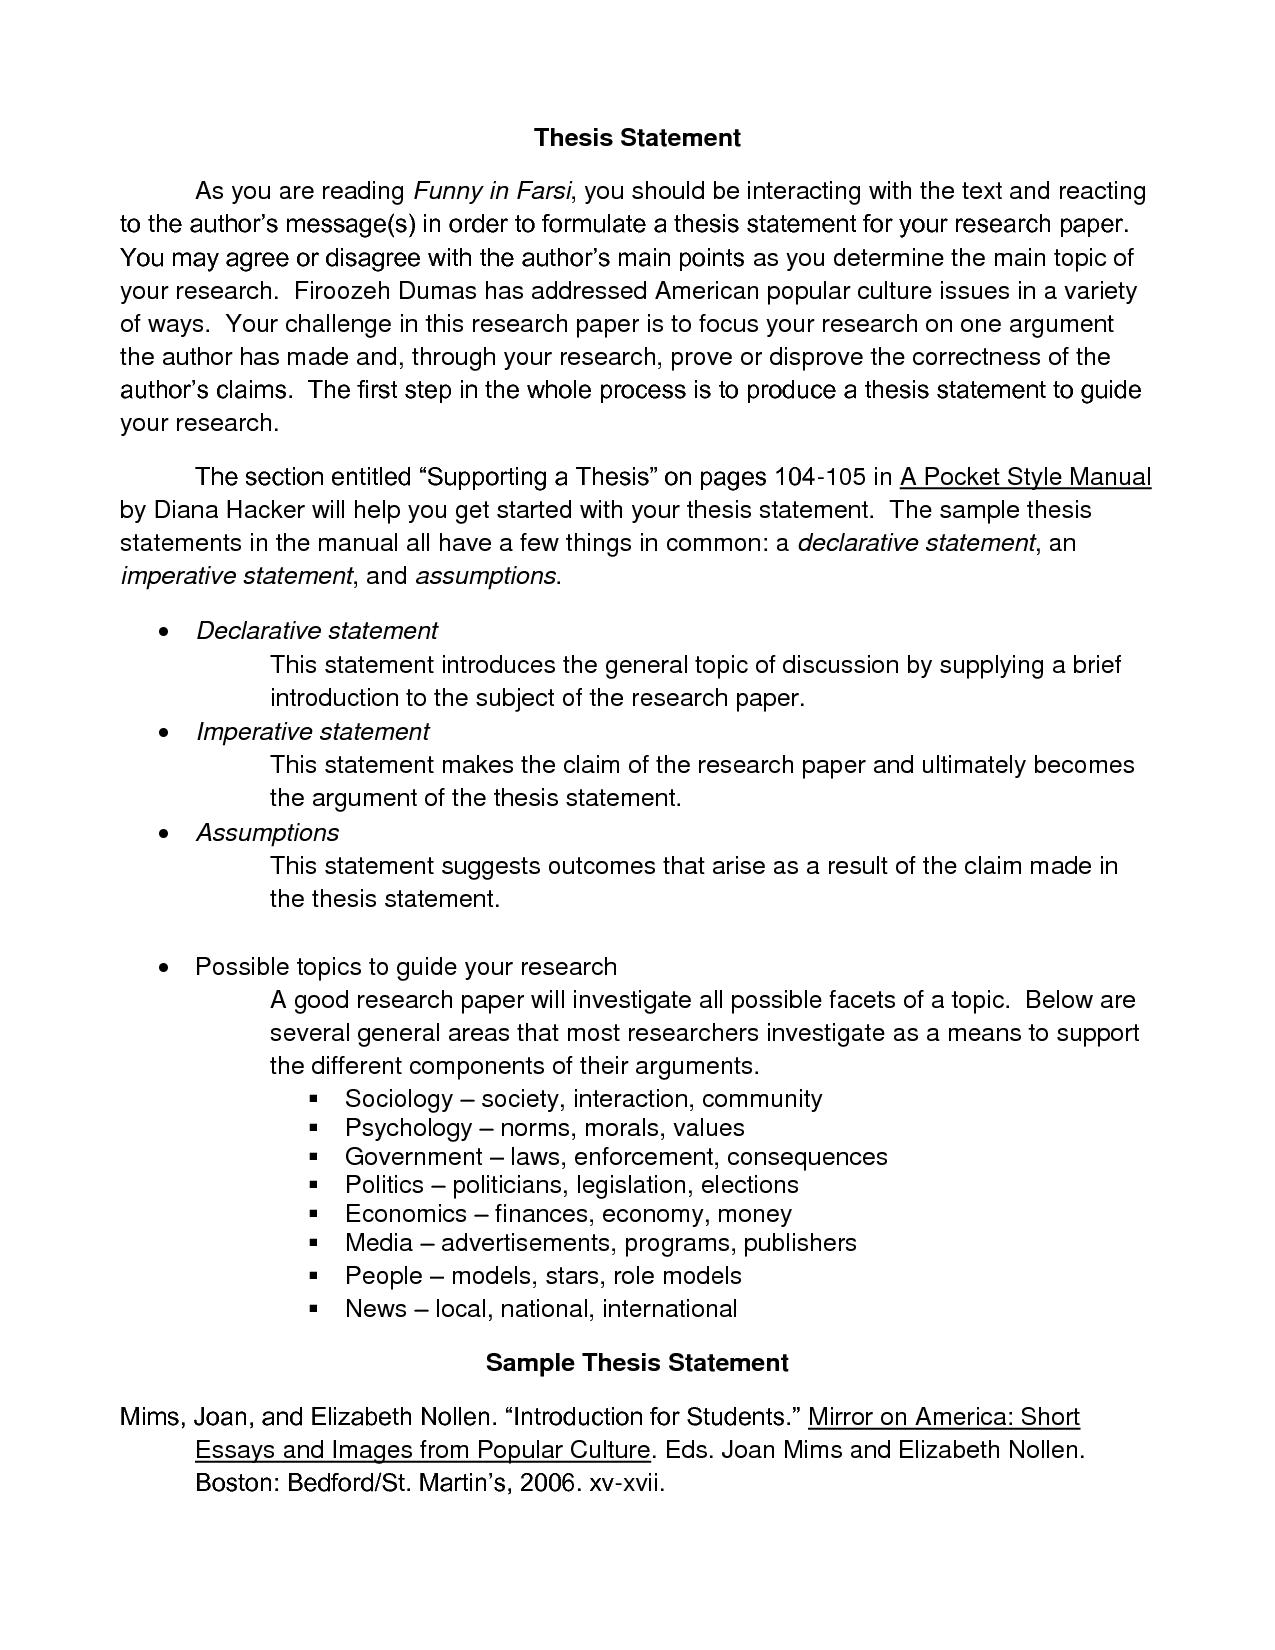 Cahsee persuasive essay rubric